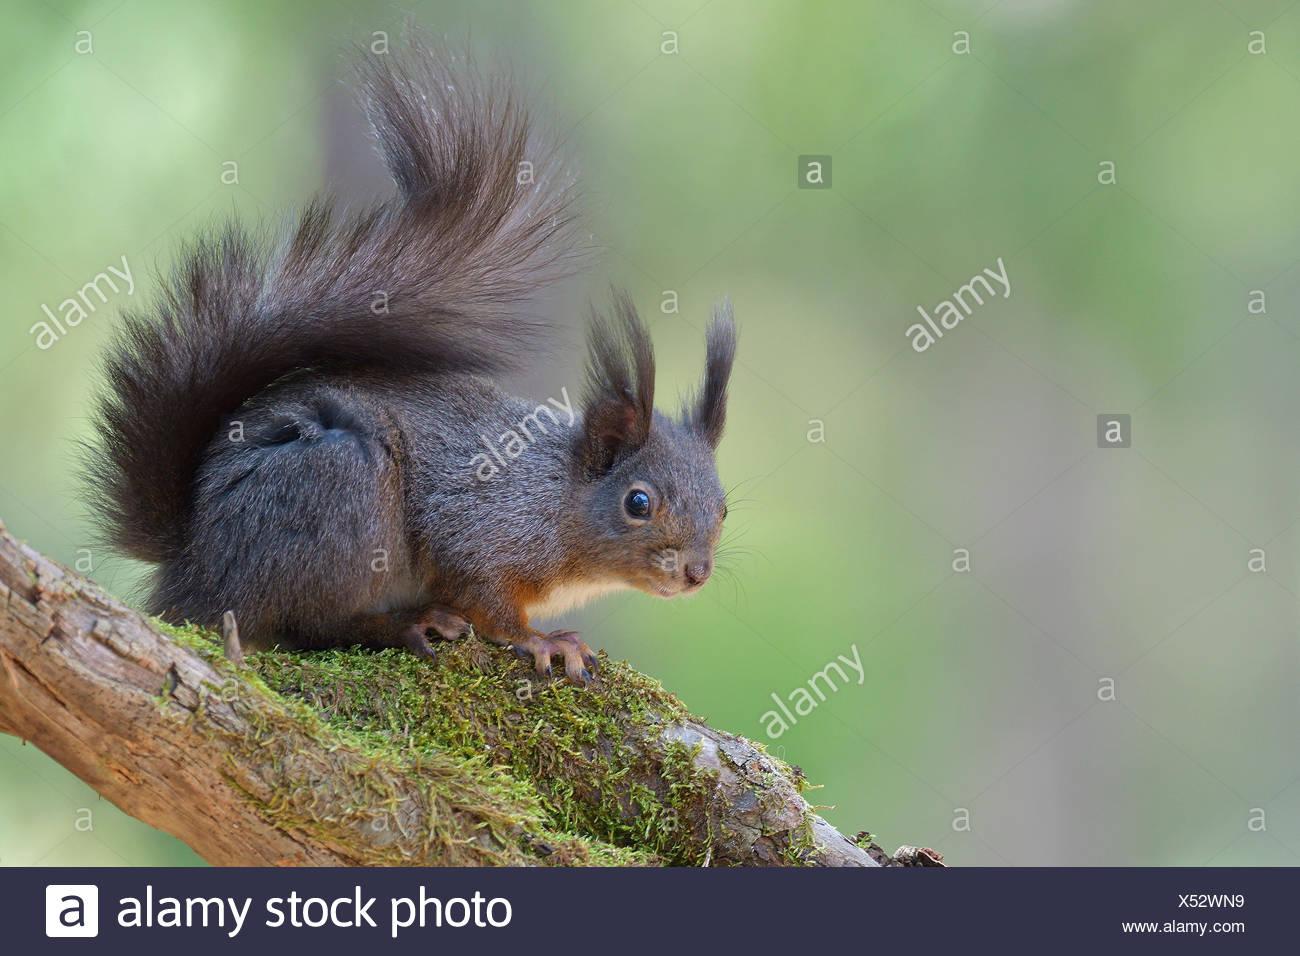 Squirrel (Sciurus vulgaris) sitting on a branch, Tyrol, Austria - Stock Image